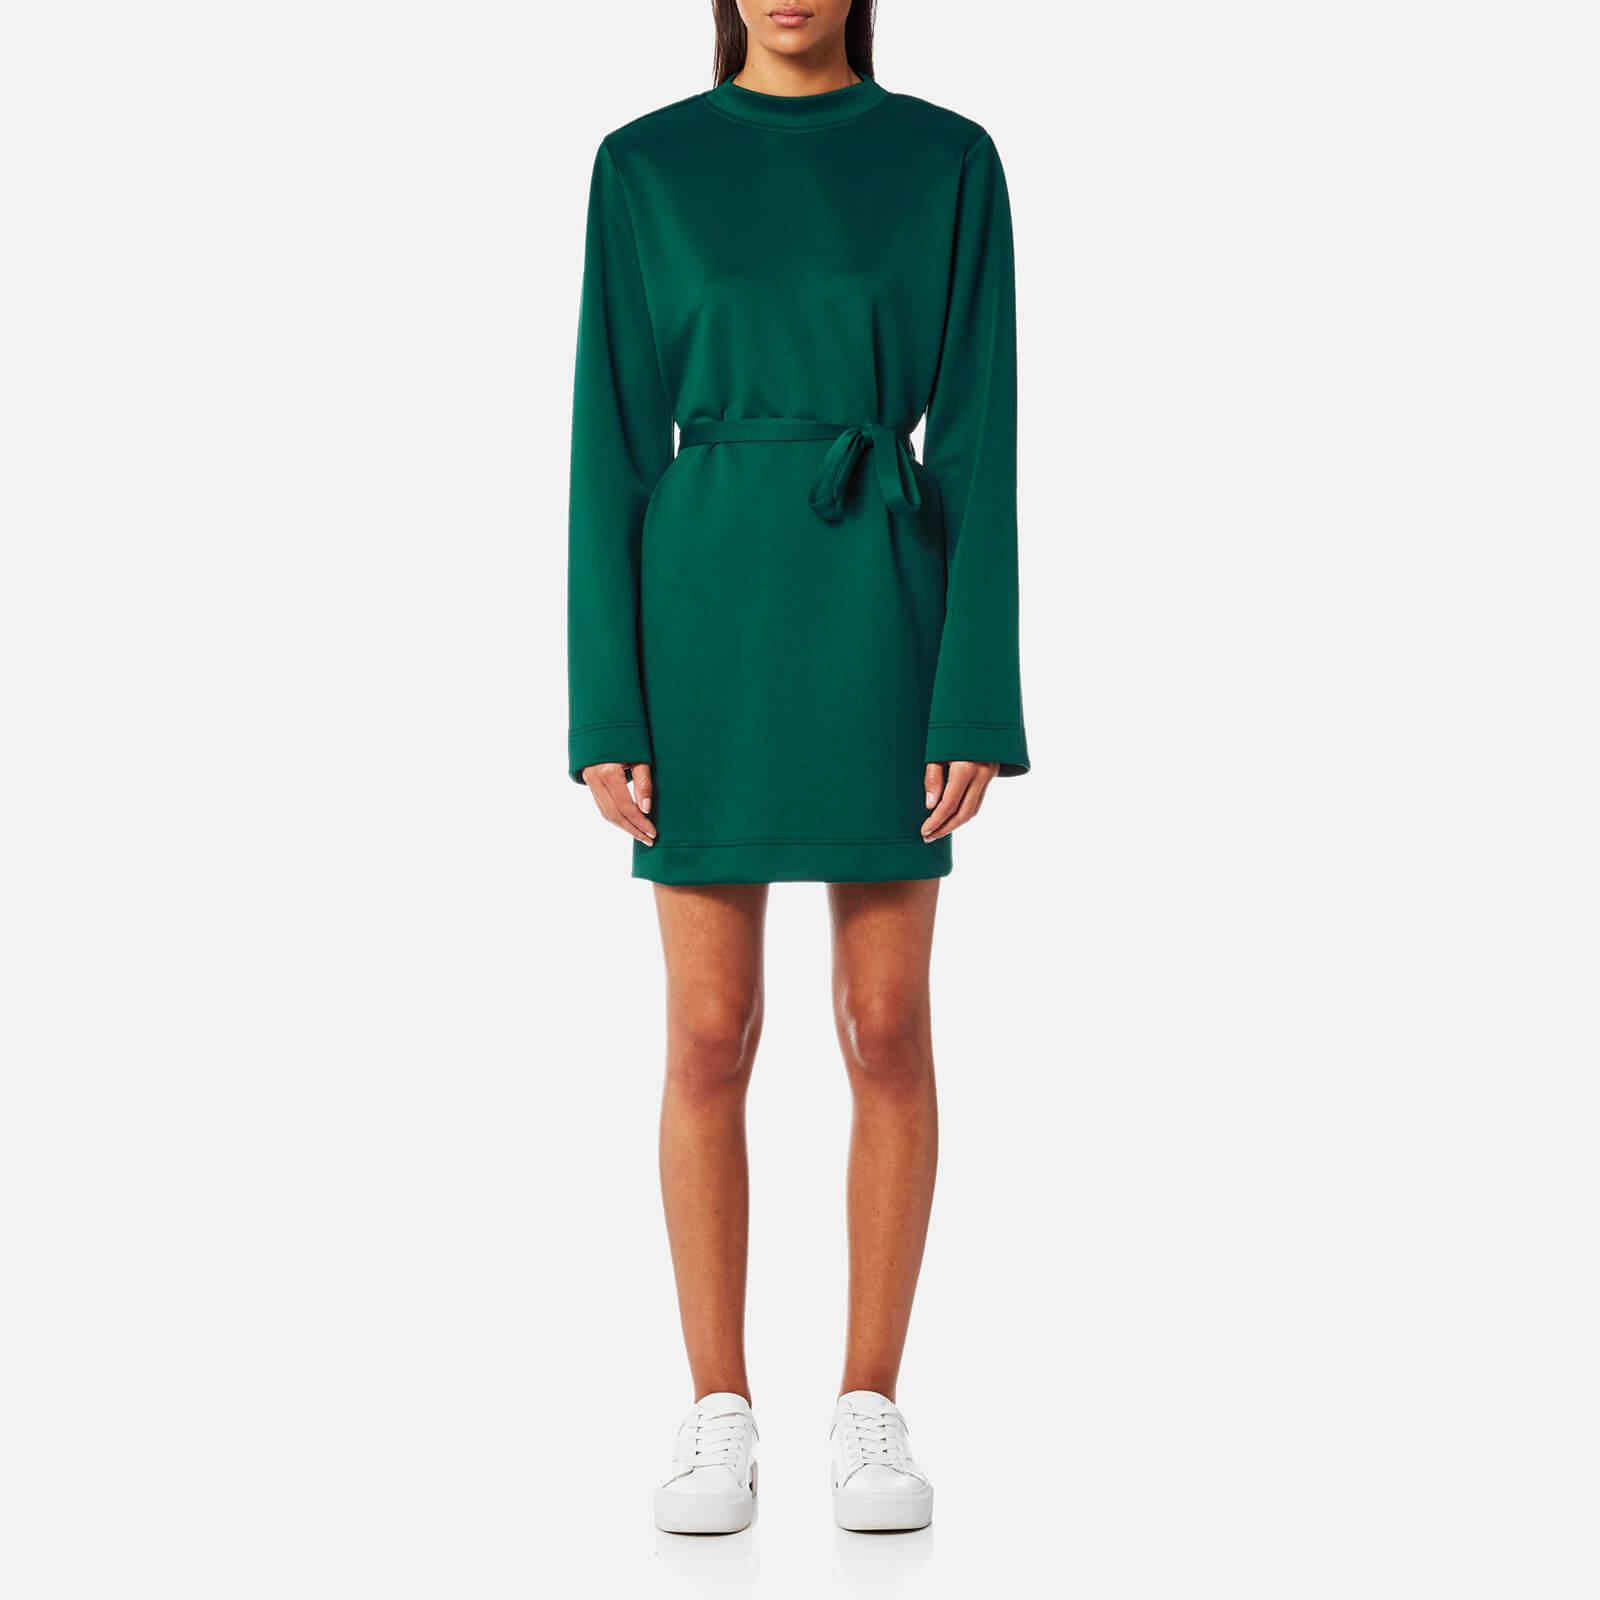 House of Sunny Women's Kicker T-Shirt Long Sleeve Dress - Organic Green - UK 8 - Green